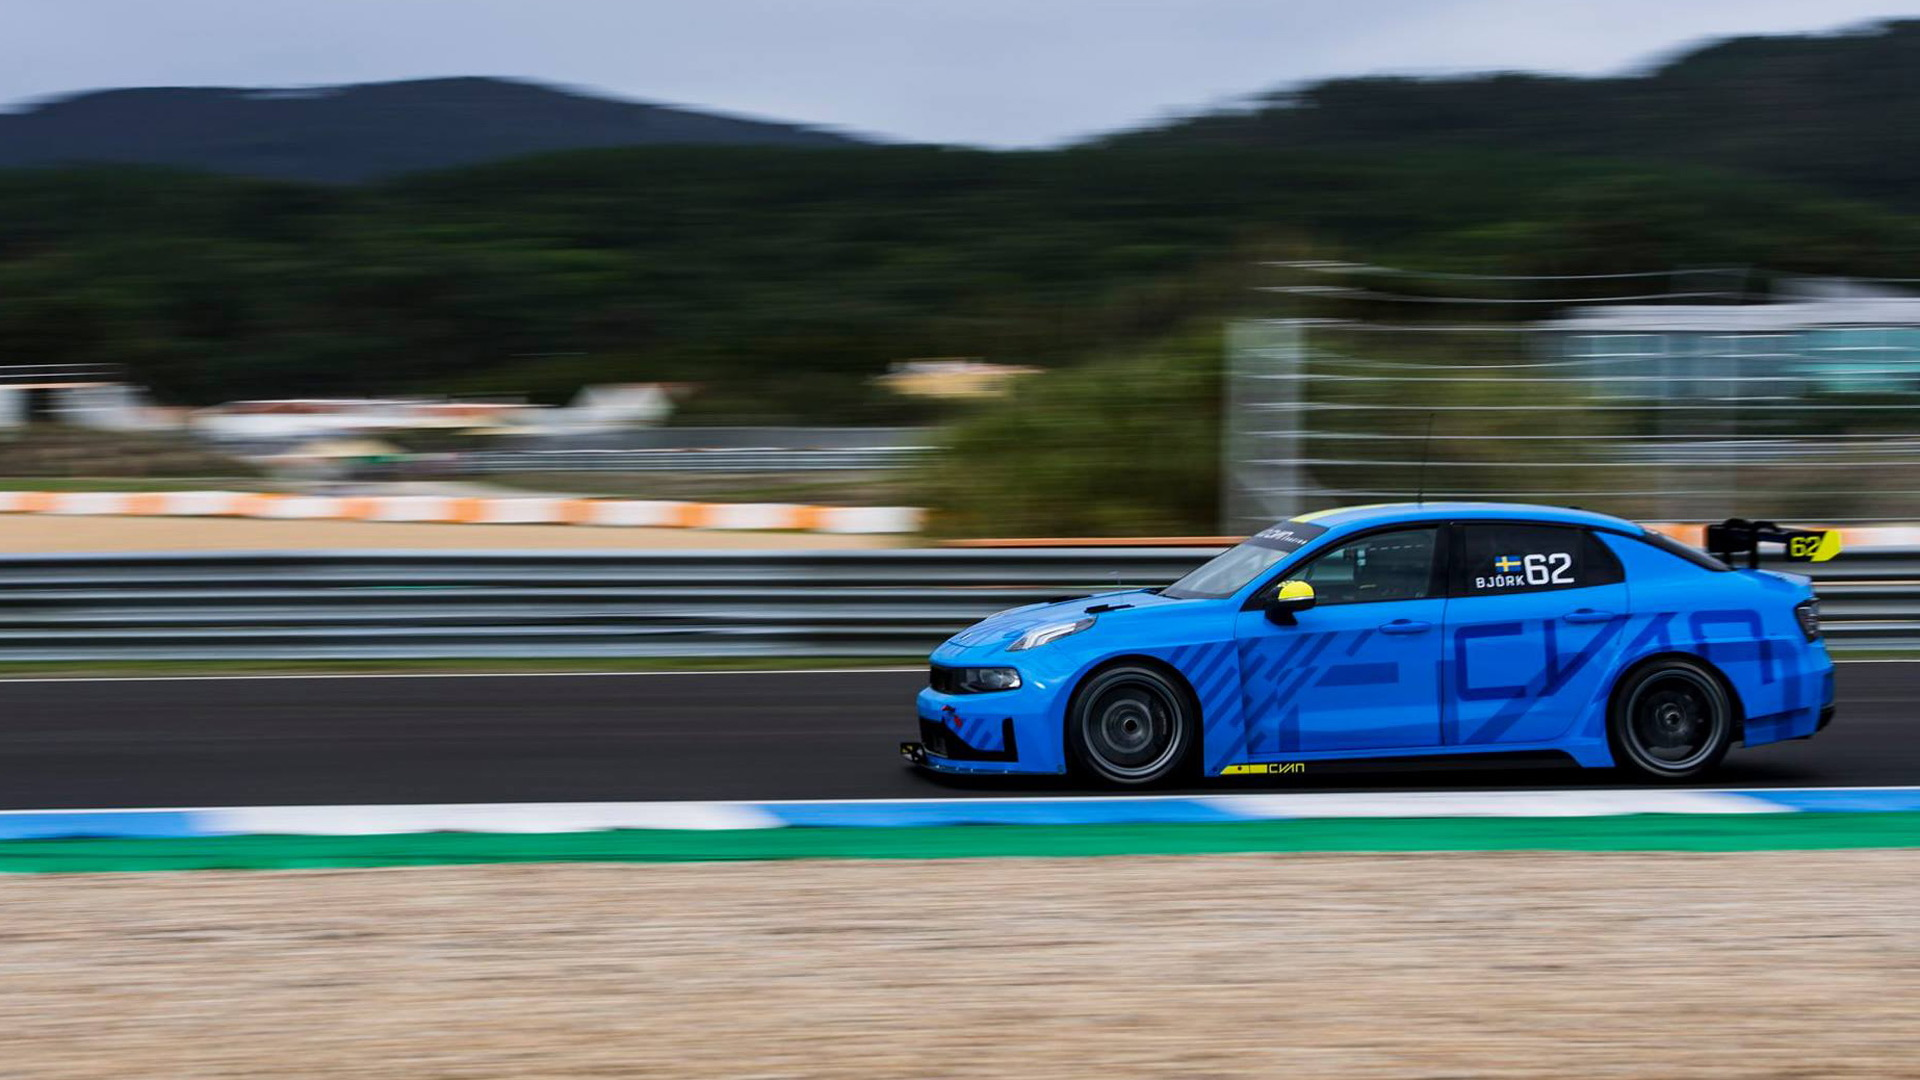 2019 Cyan Racing Lynk & Co. 03 TCR race car